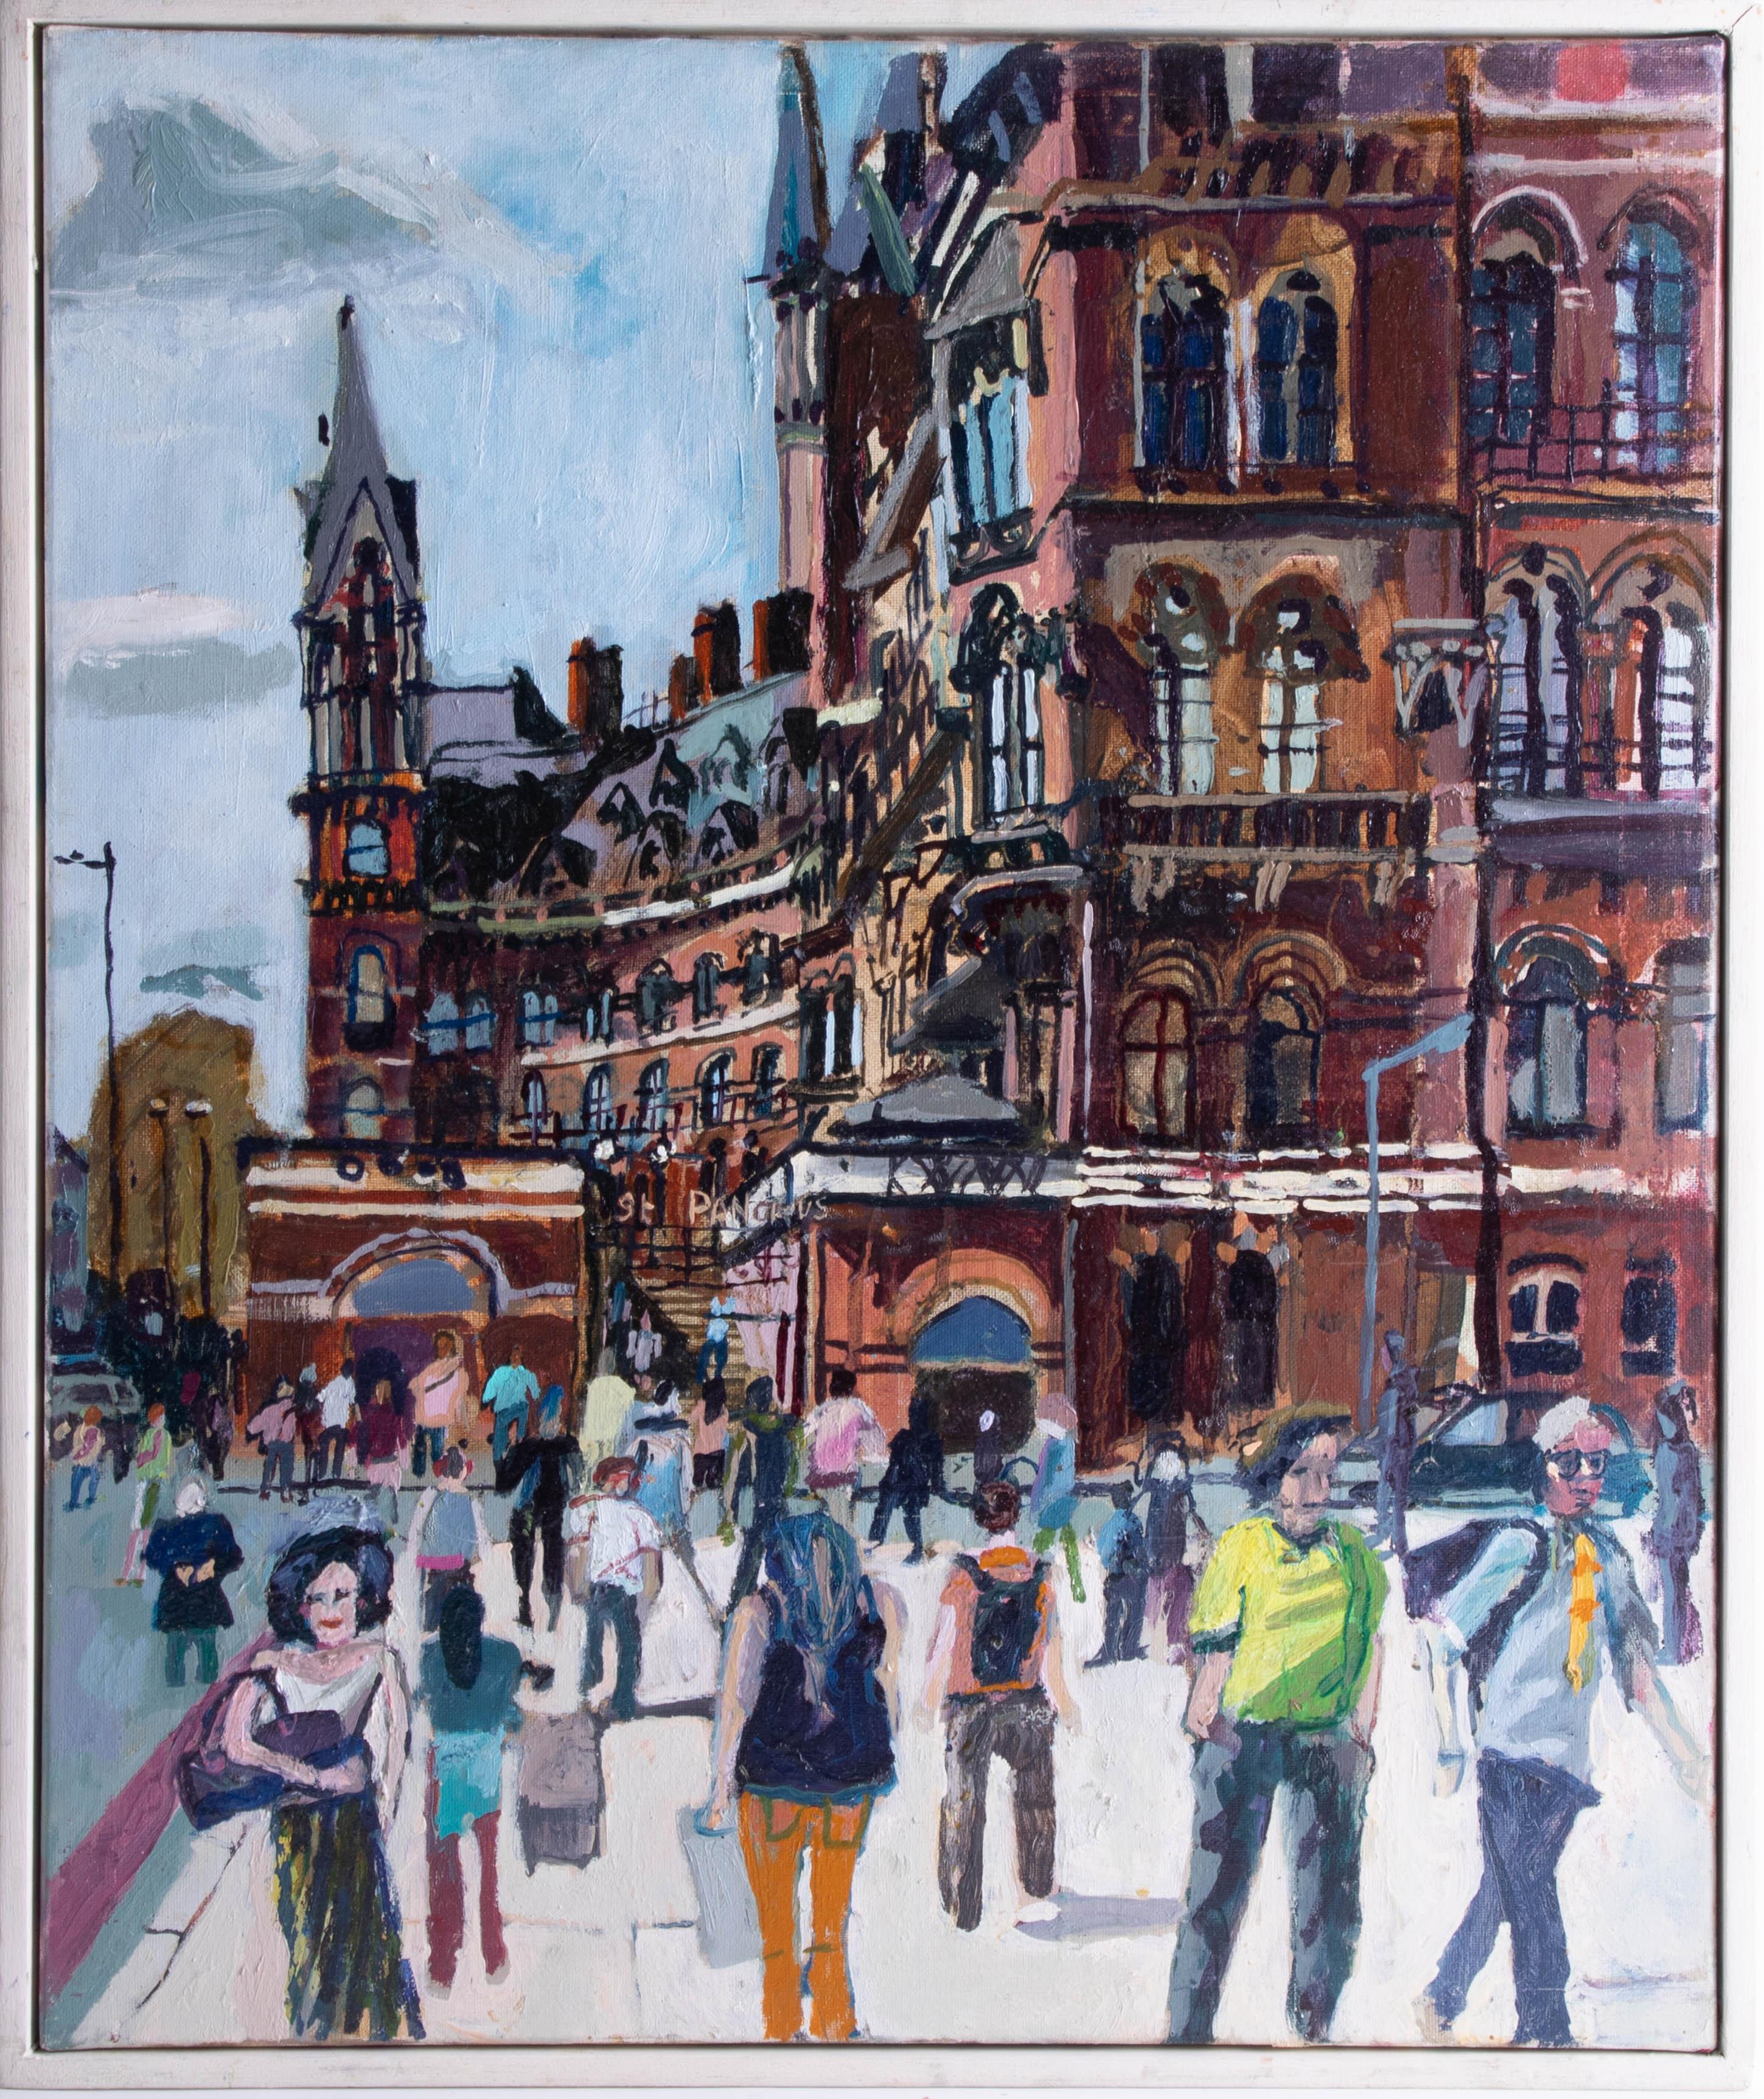 Lot 18 - Nicholas Borden, oil on canvas 'Kings Cross, St. Pancras, London', 60cm x 50cm, framed, signed on